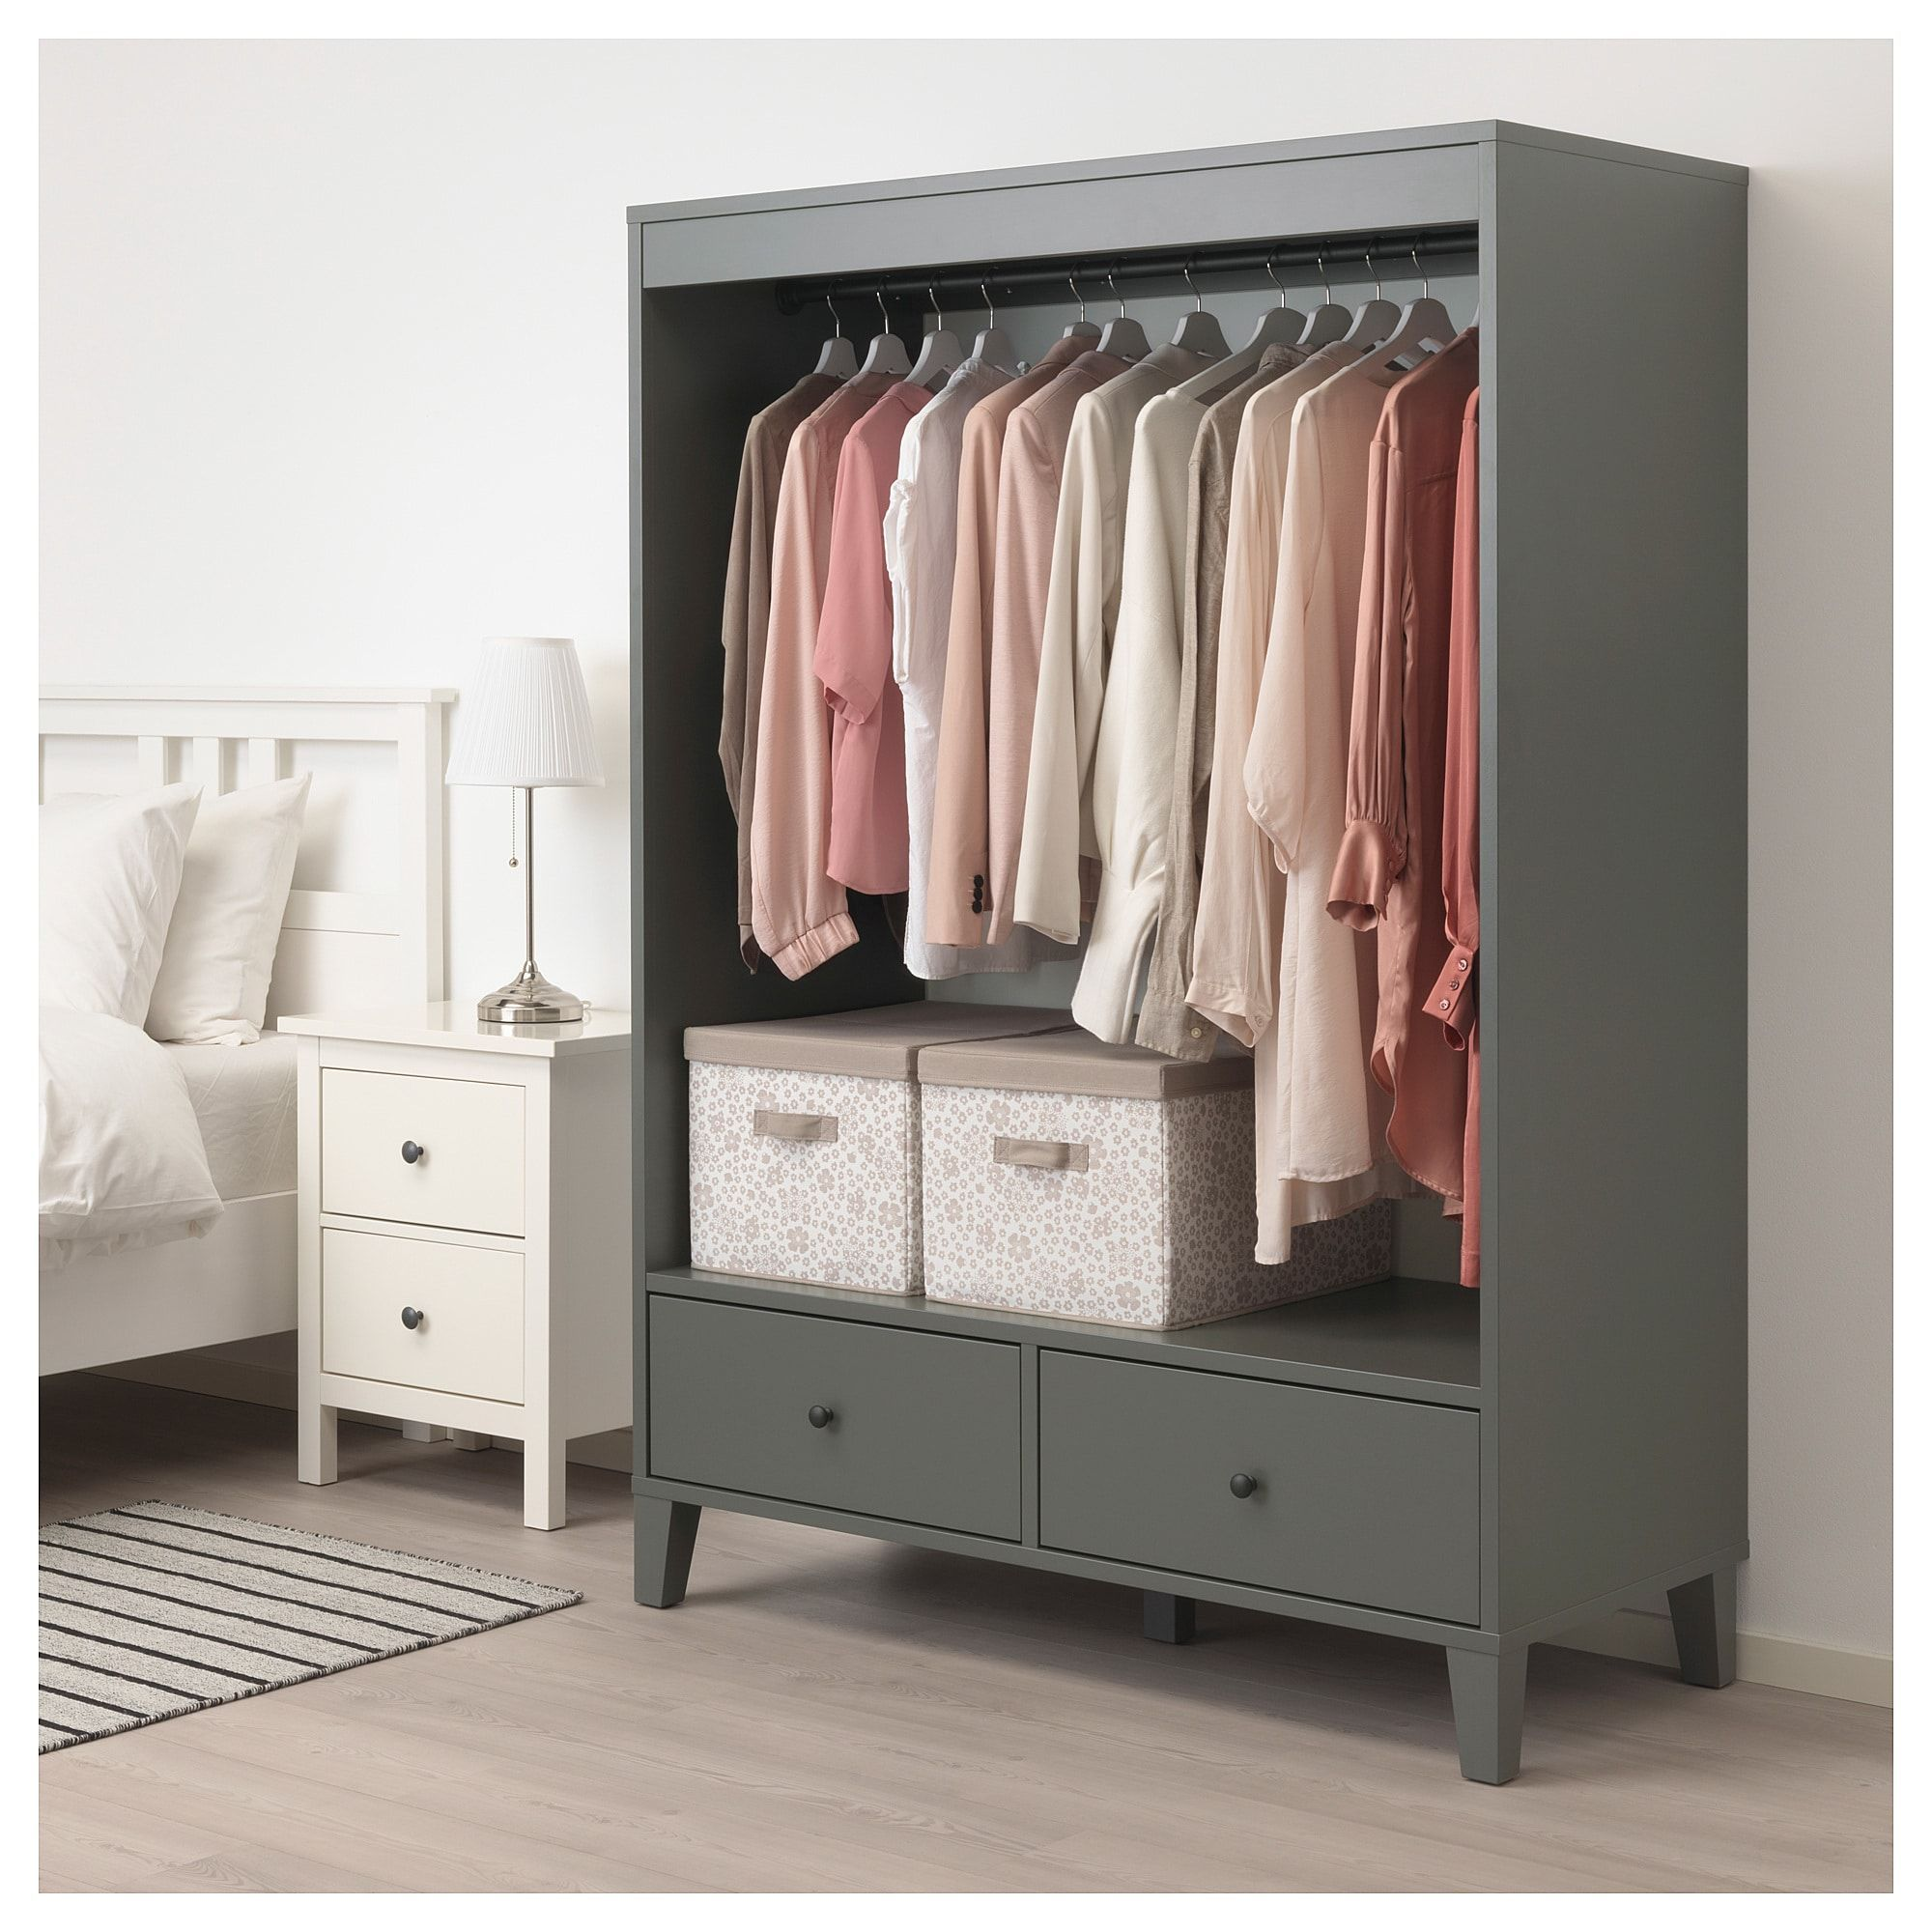 Wardrobe Living Room Storage Ikea Bryggja Open Wardrobe Dark Gray Open Wardrobe Ikea Open Wardrobe Open Closet